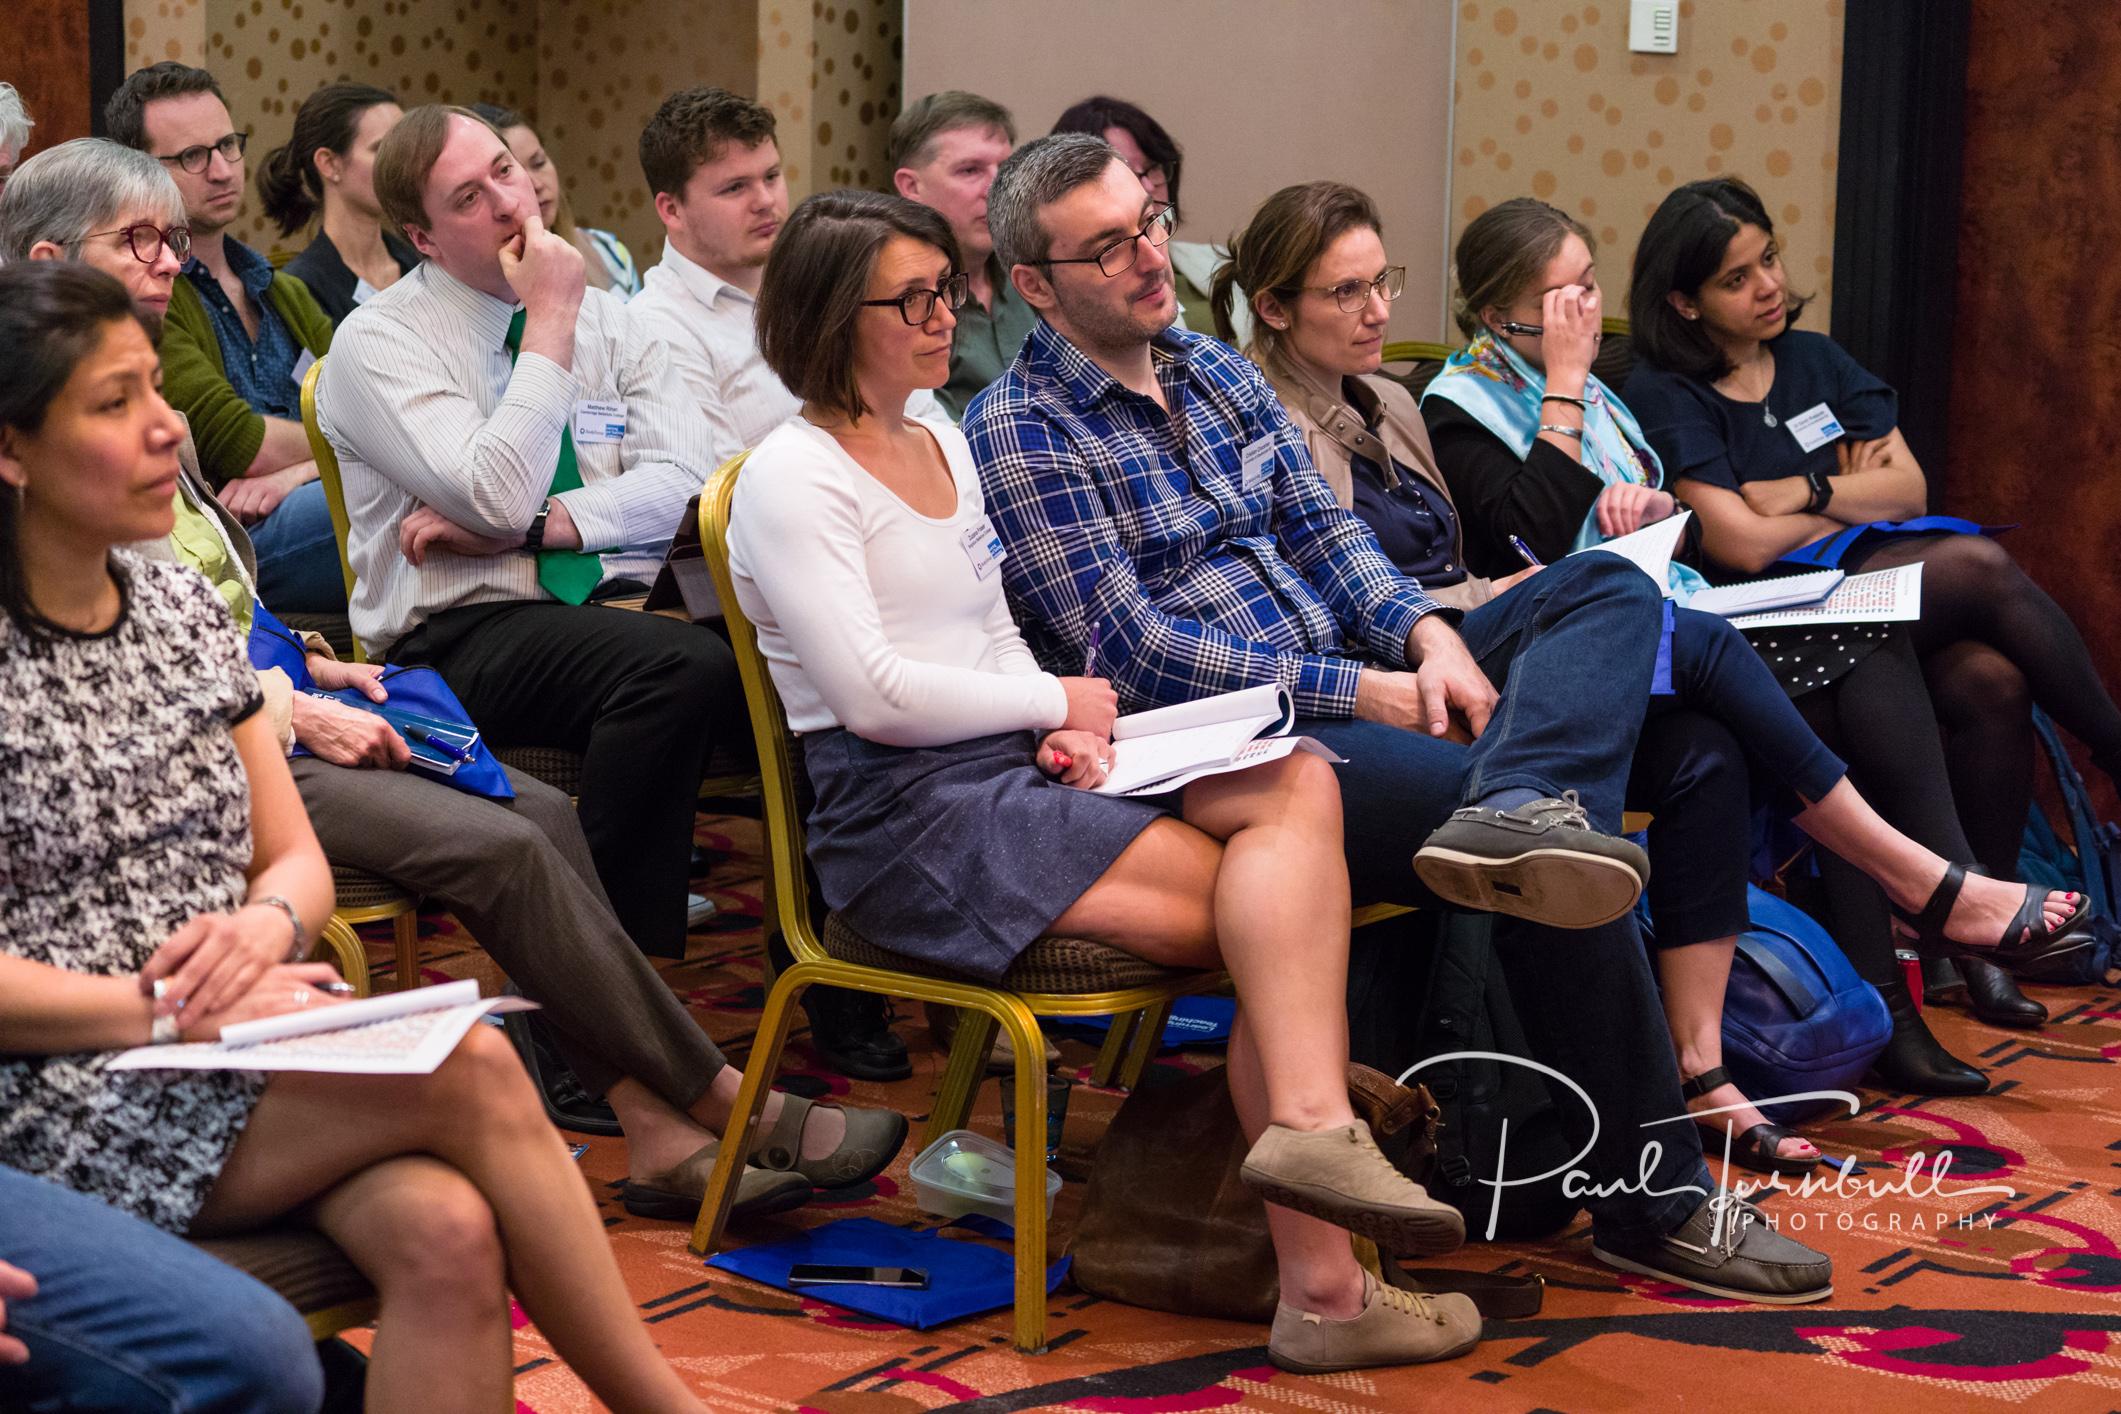 conference-event-photographer-queens-hotel-leeds-yorkshire-075.jpg